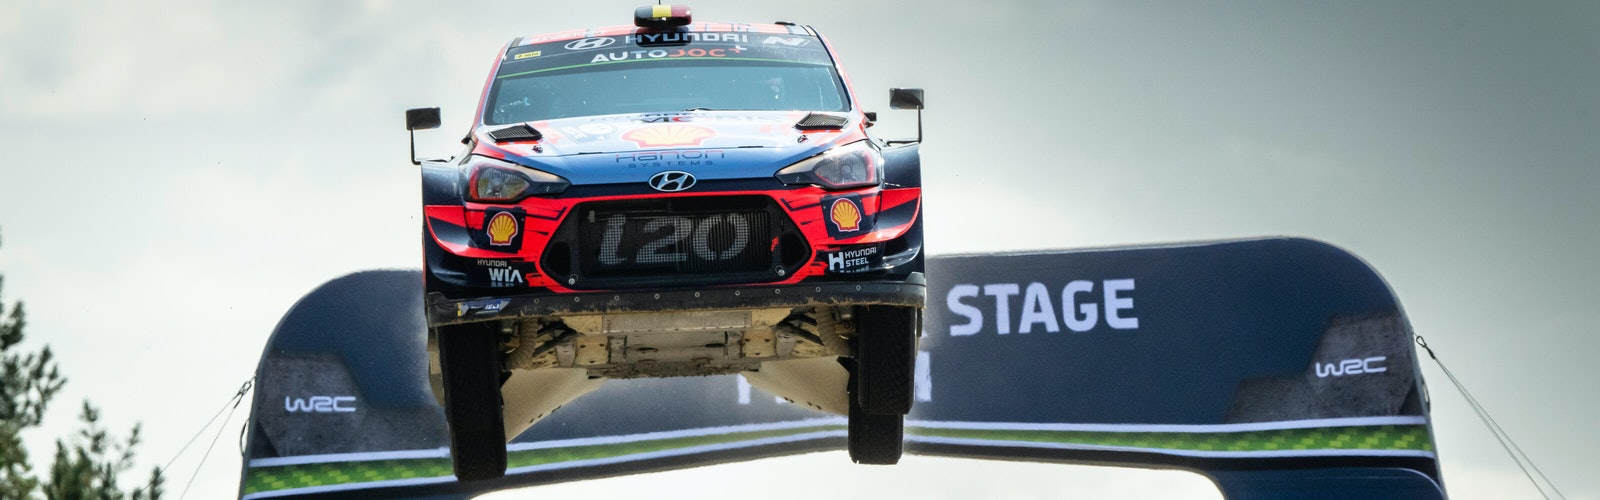 Thierry Neuville Hyundai WRC Rally Finland 2019